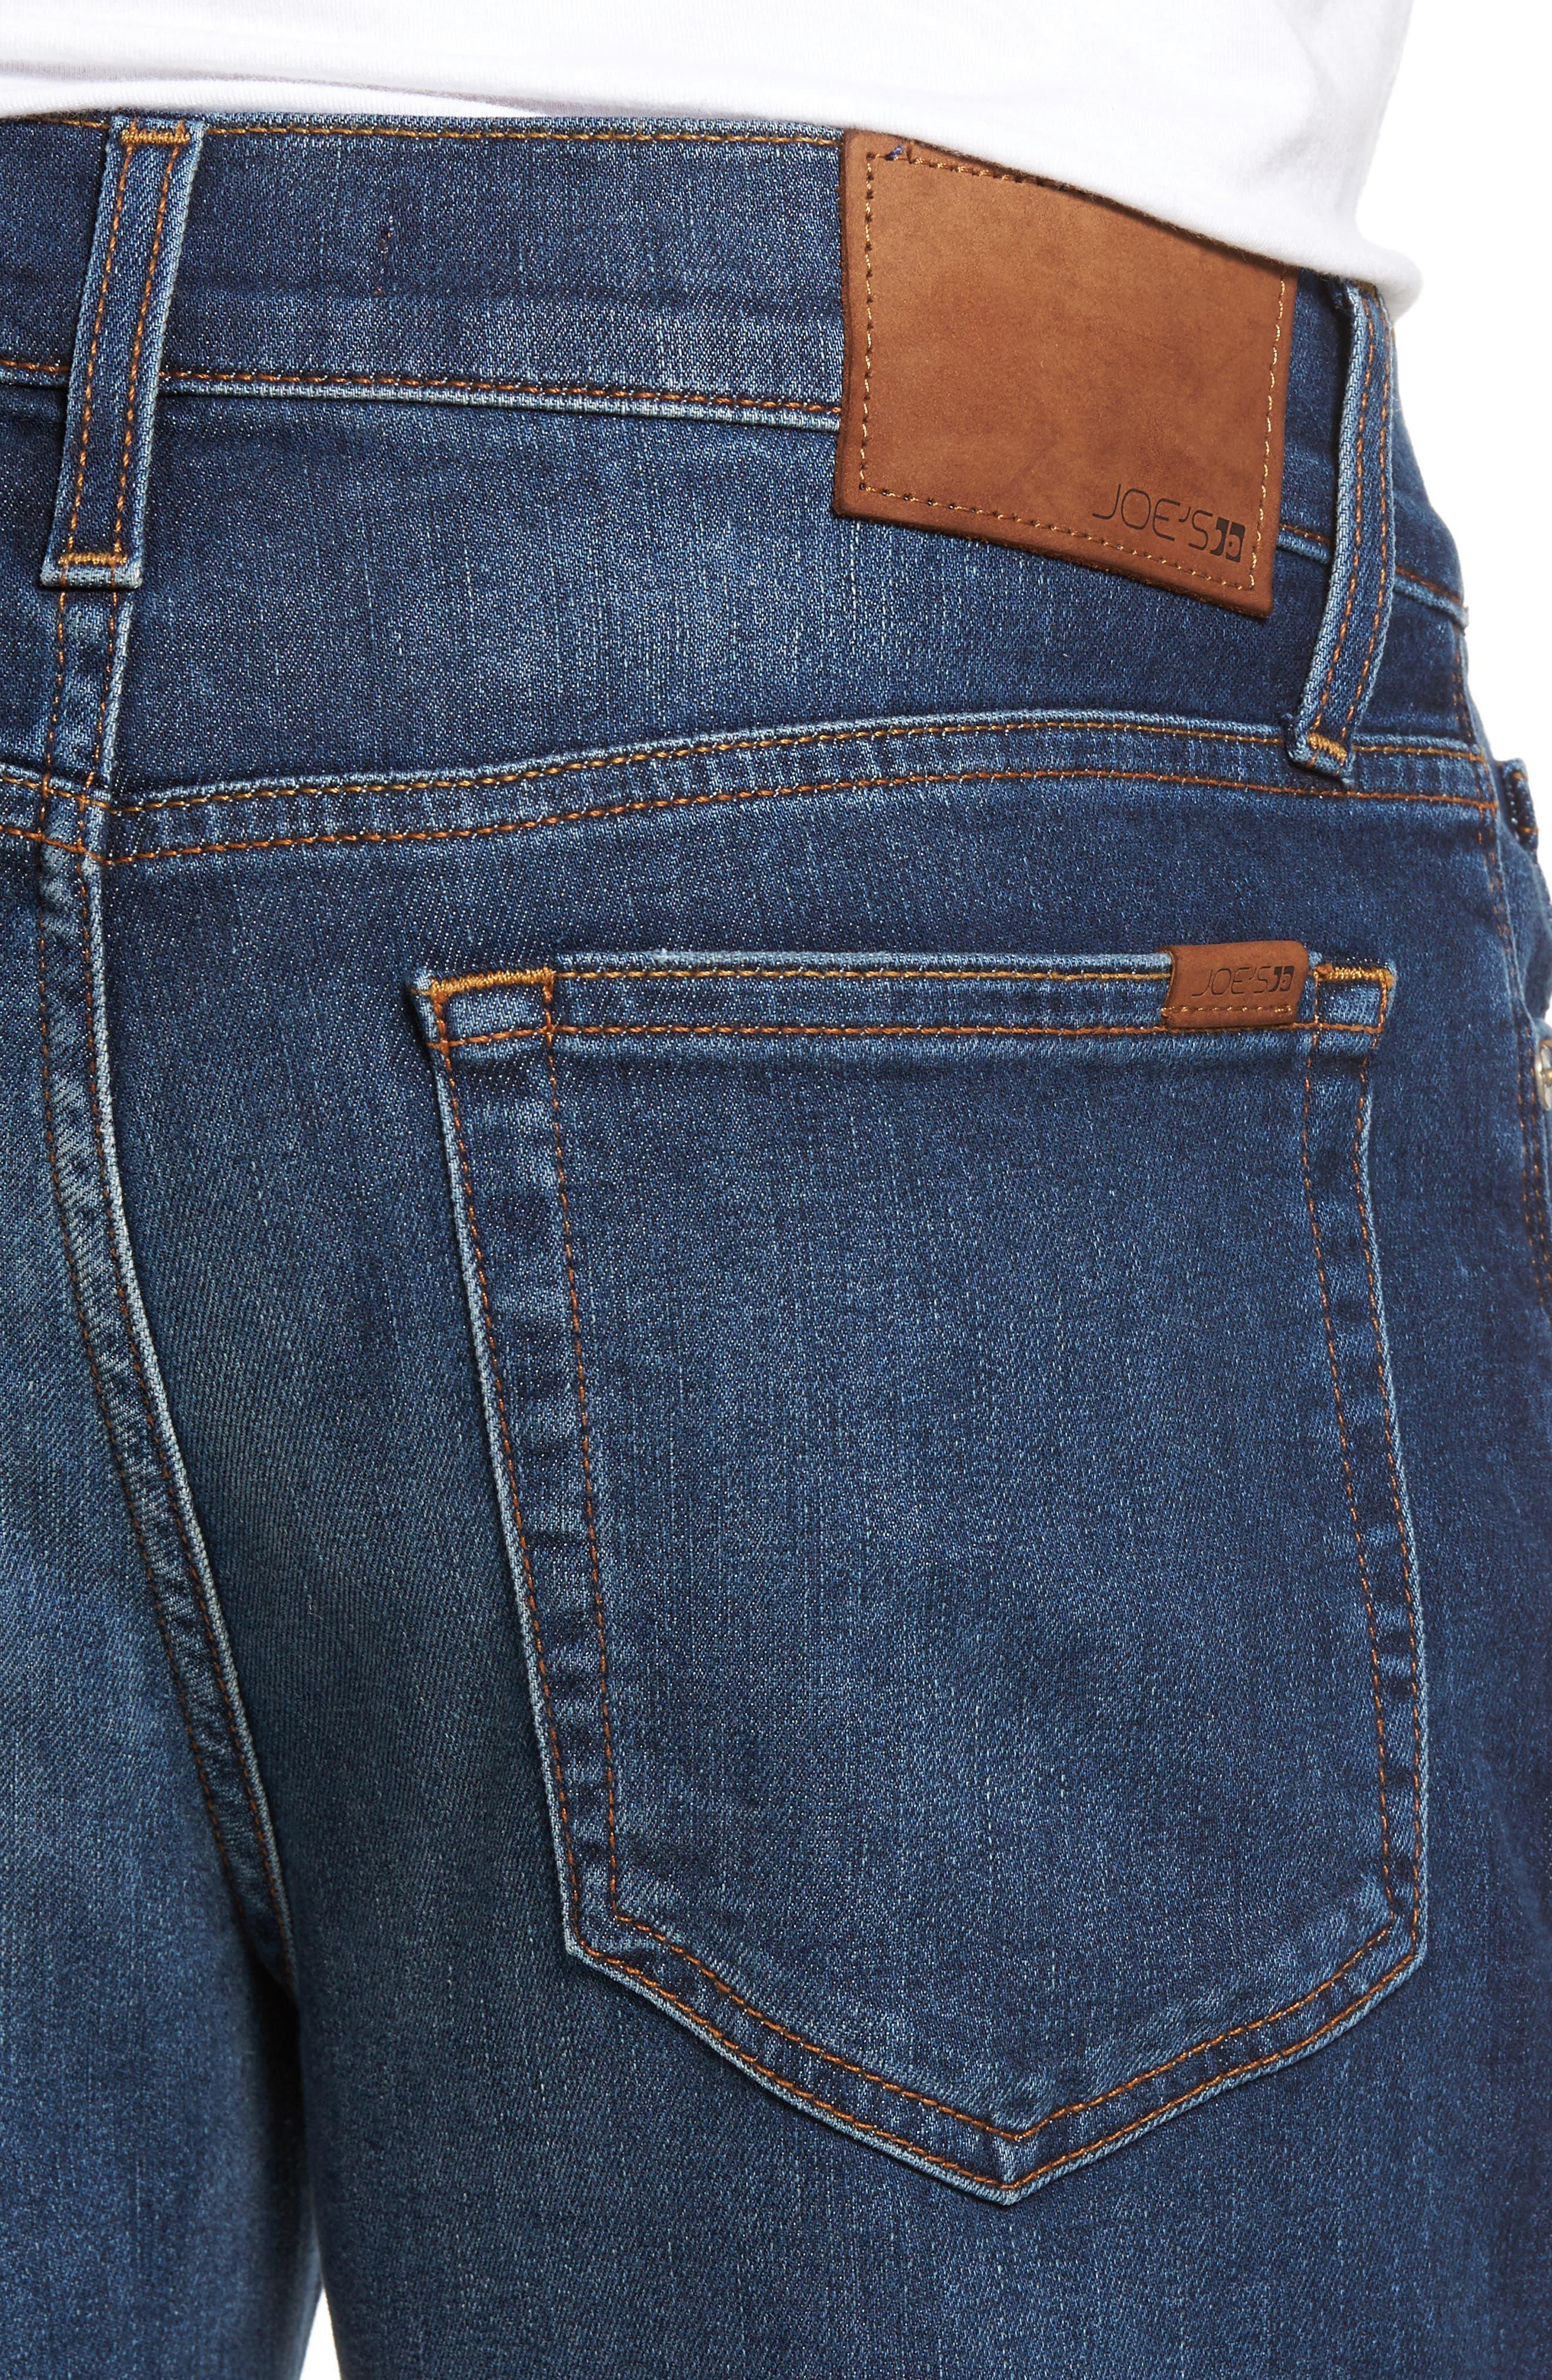 Slim Fit Jeans,                             Alternate thumbnail 4, color,                             Yates